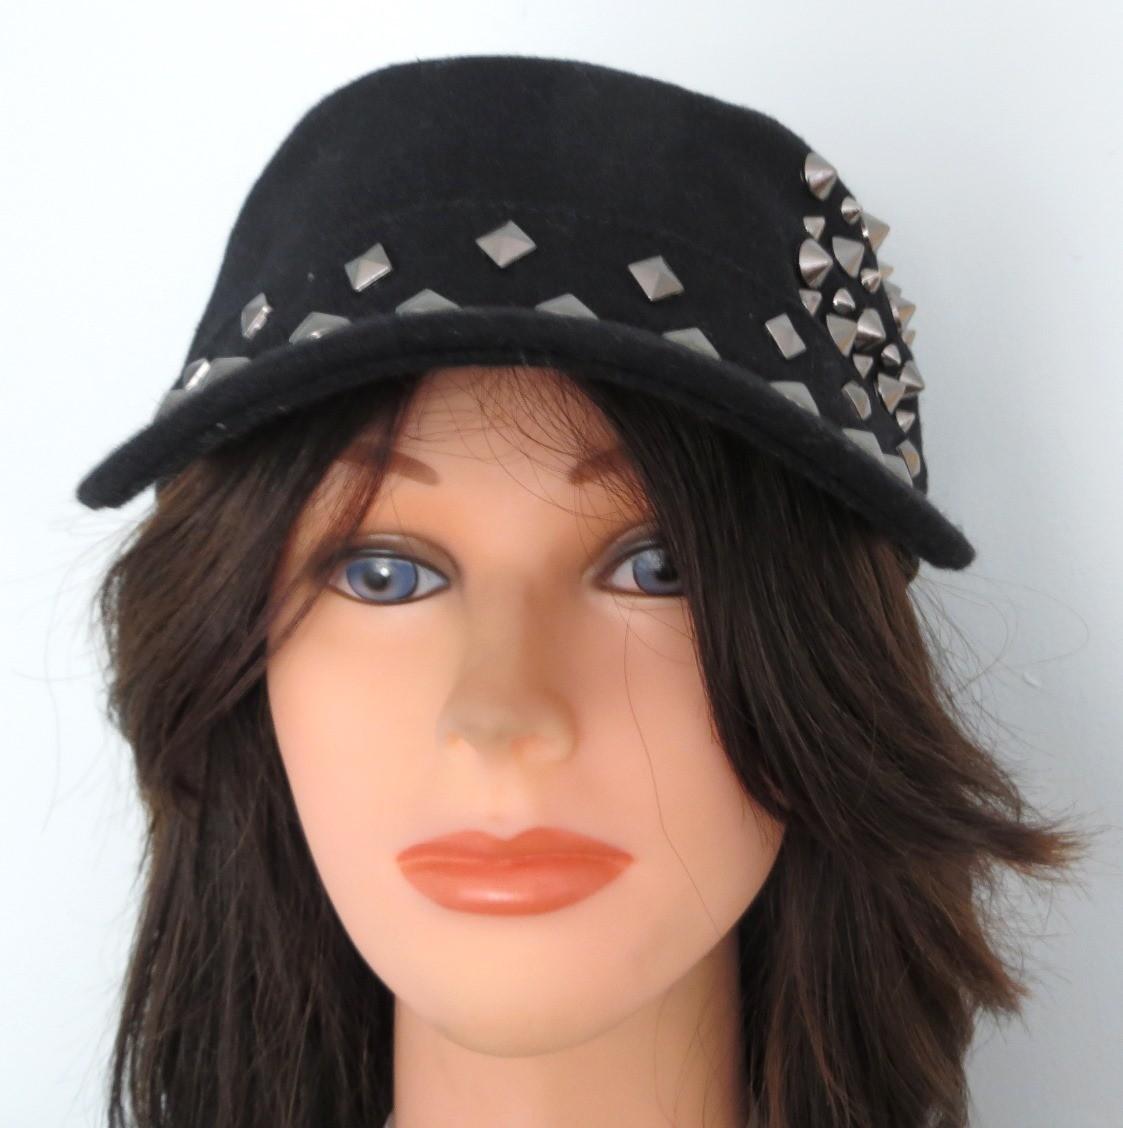 Black spiked cap